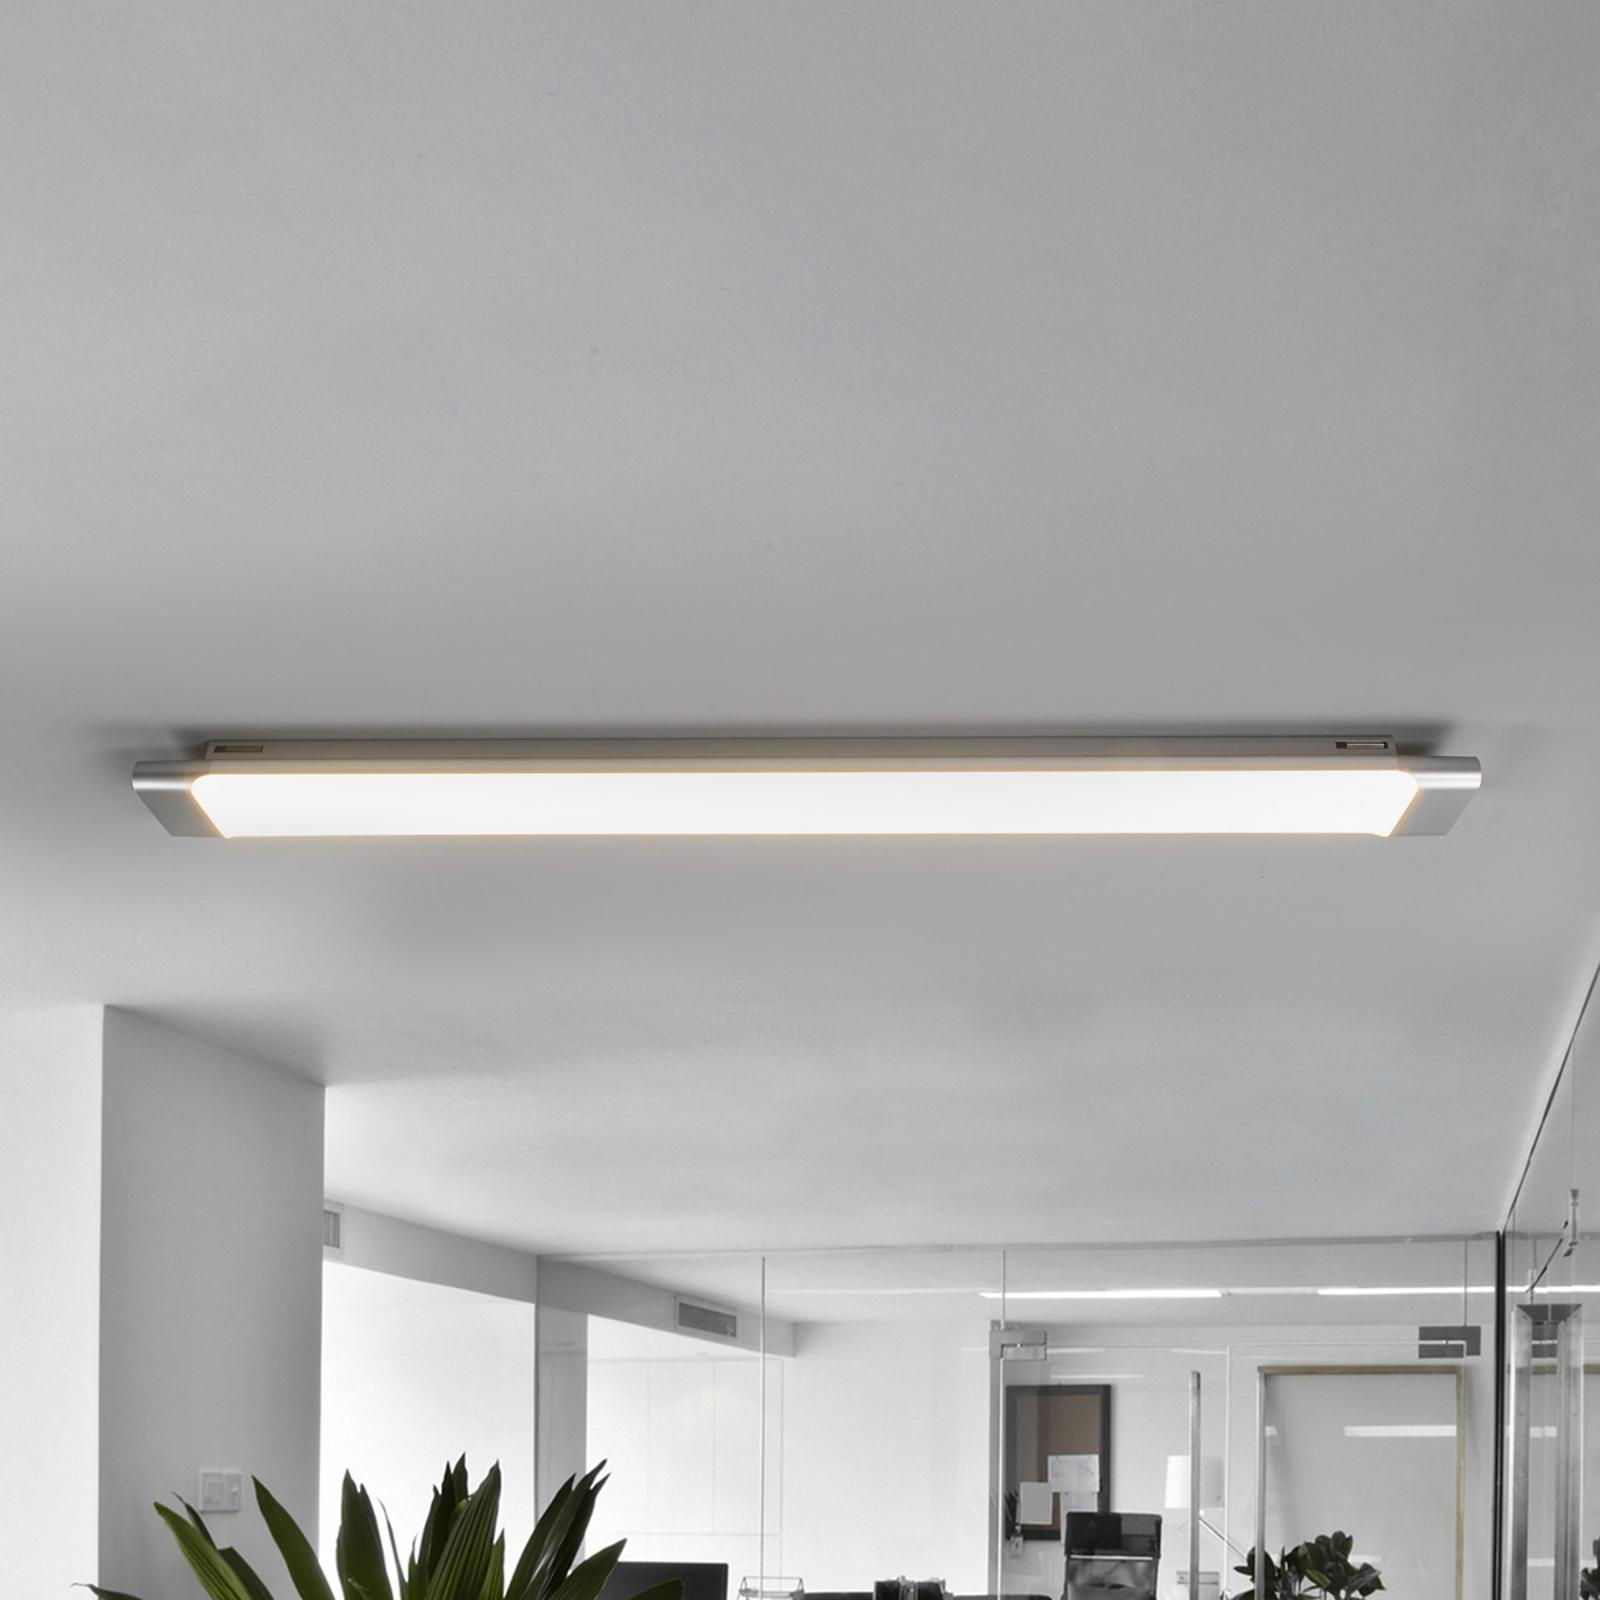 Praktyczna lampa sufitowa LED Vinca, 90 cm